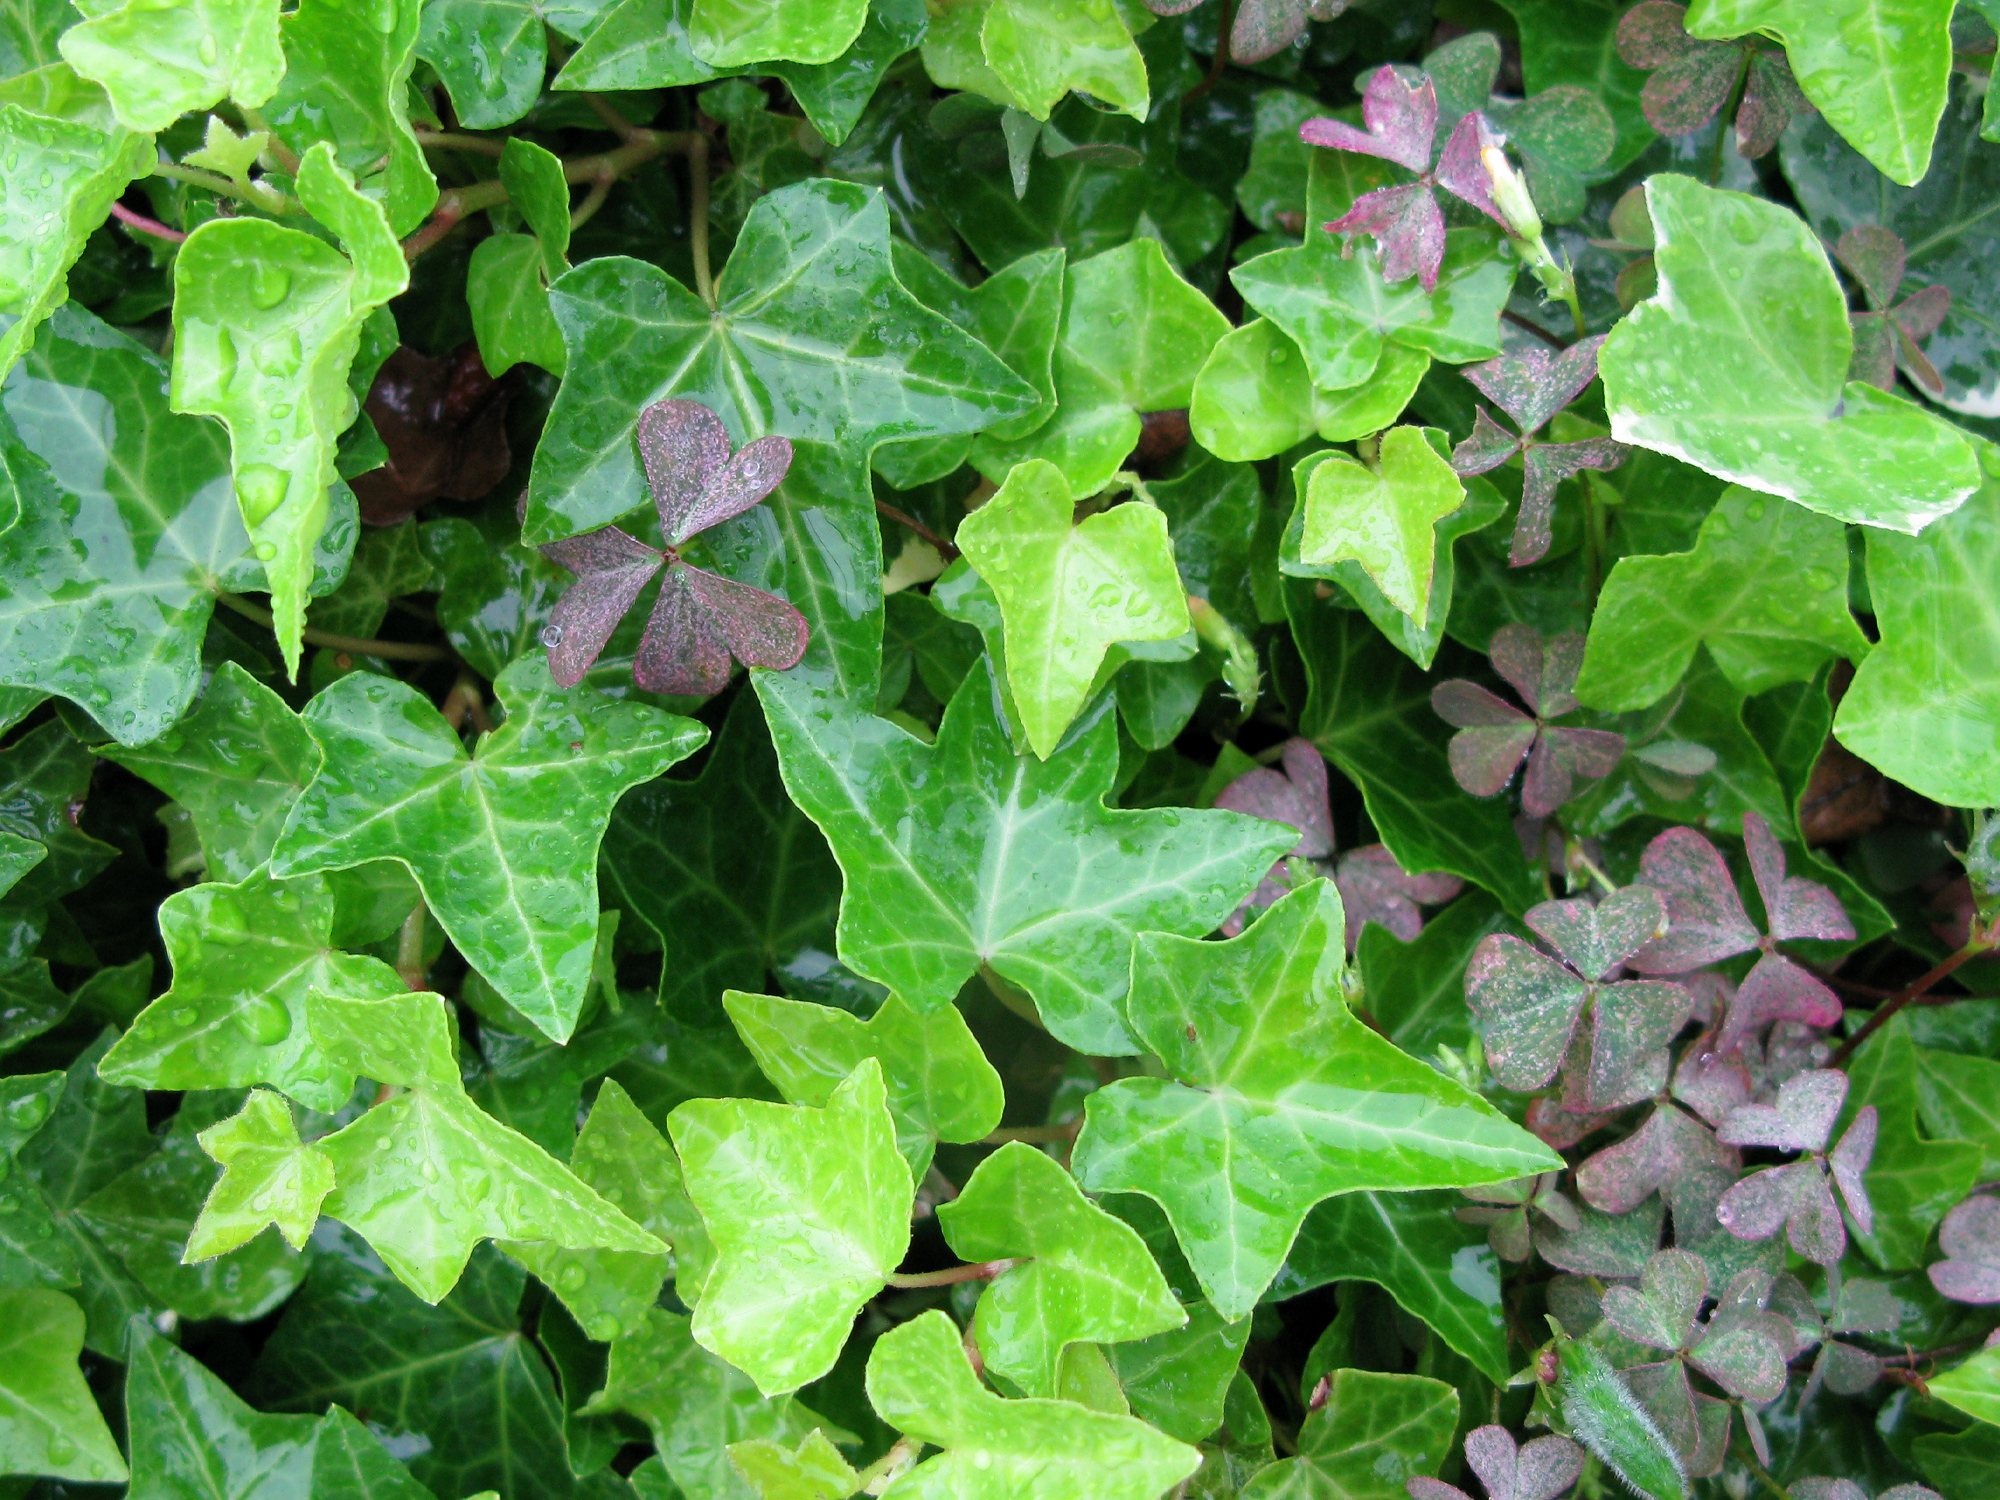 ivy-photo-1-jpcom03.jpg